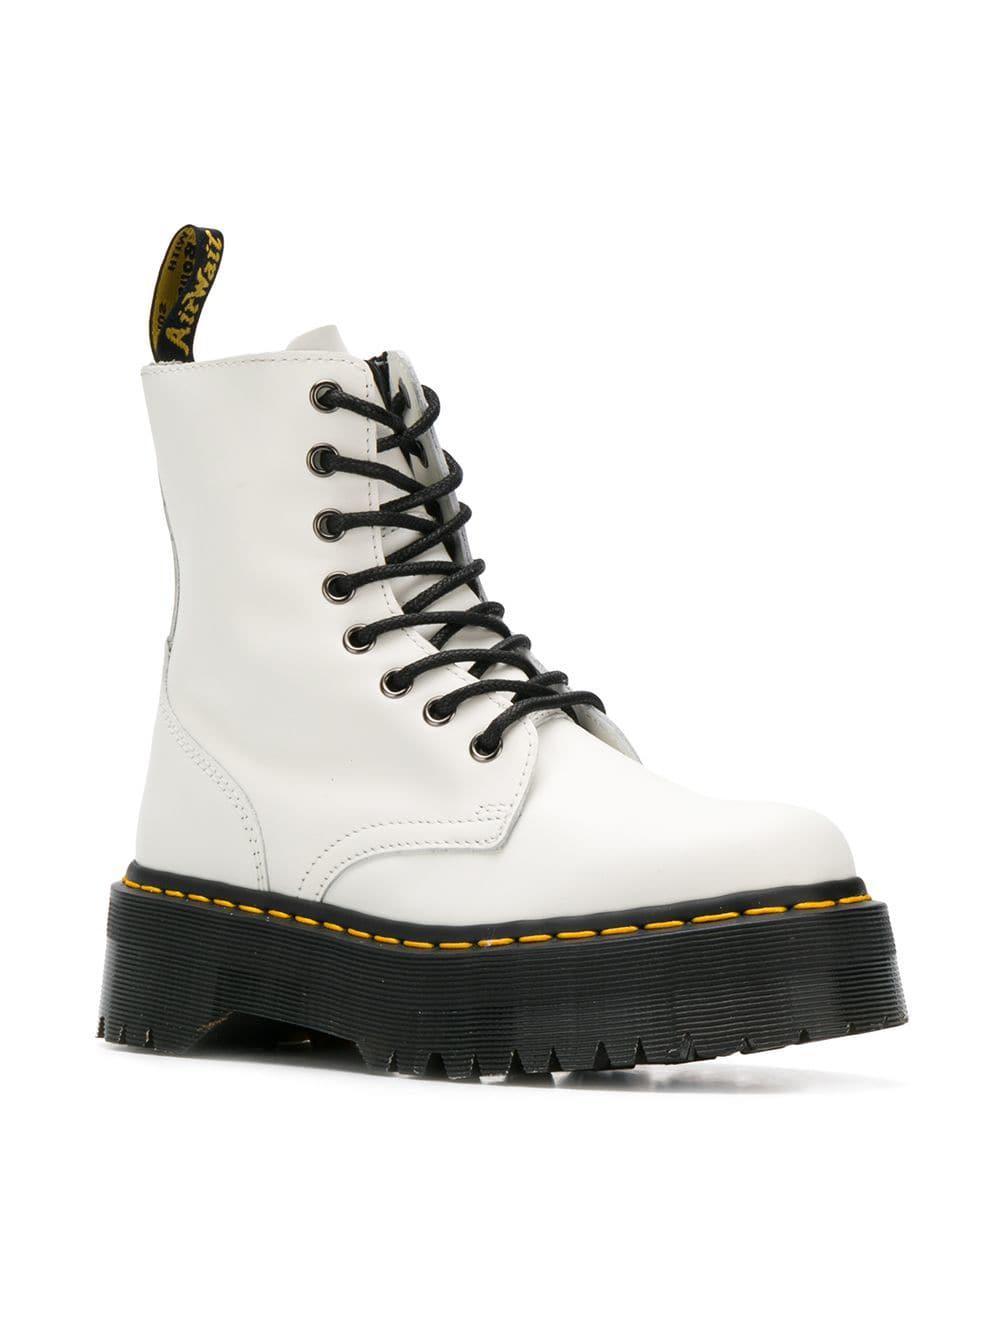 8b4d762a1b02 Lyst - Dr. Martens Jadon Boots in White